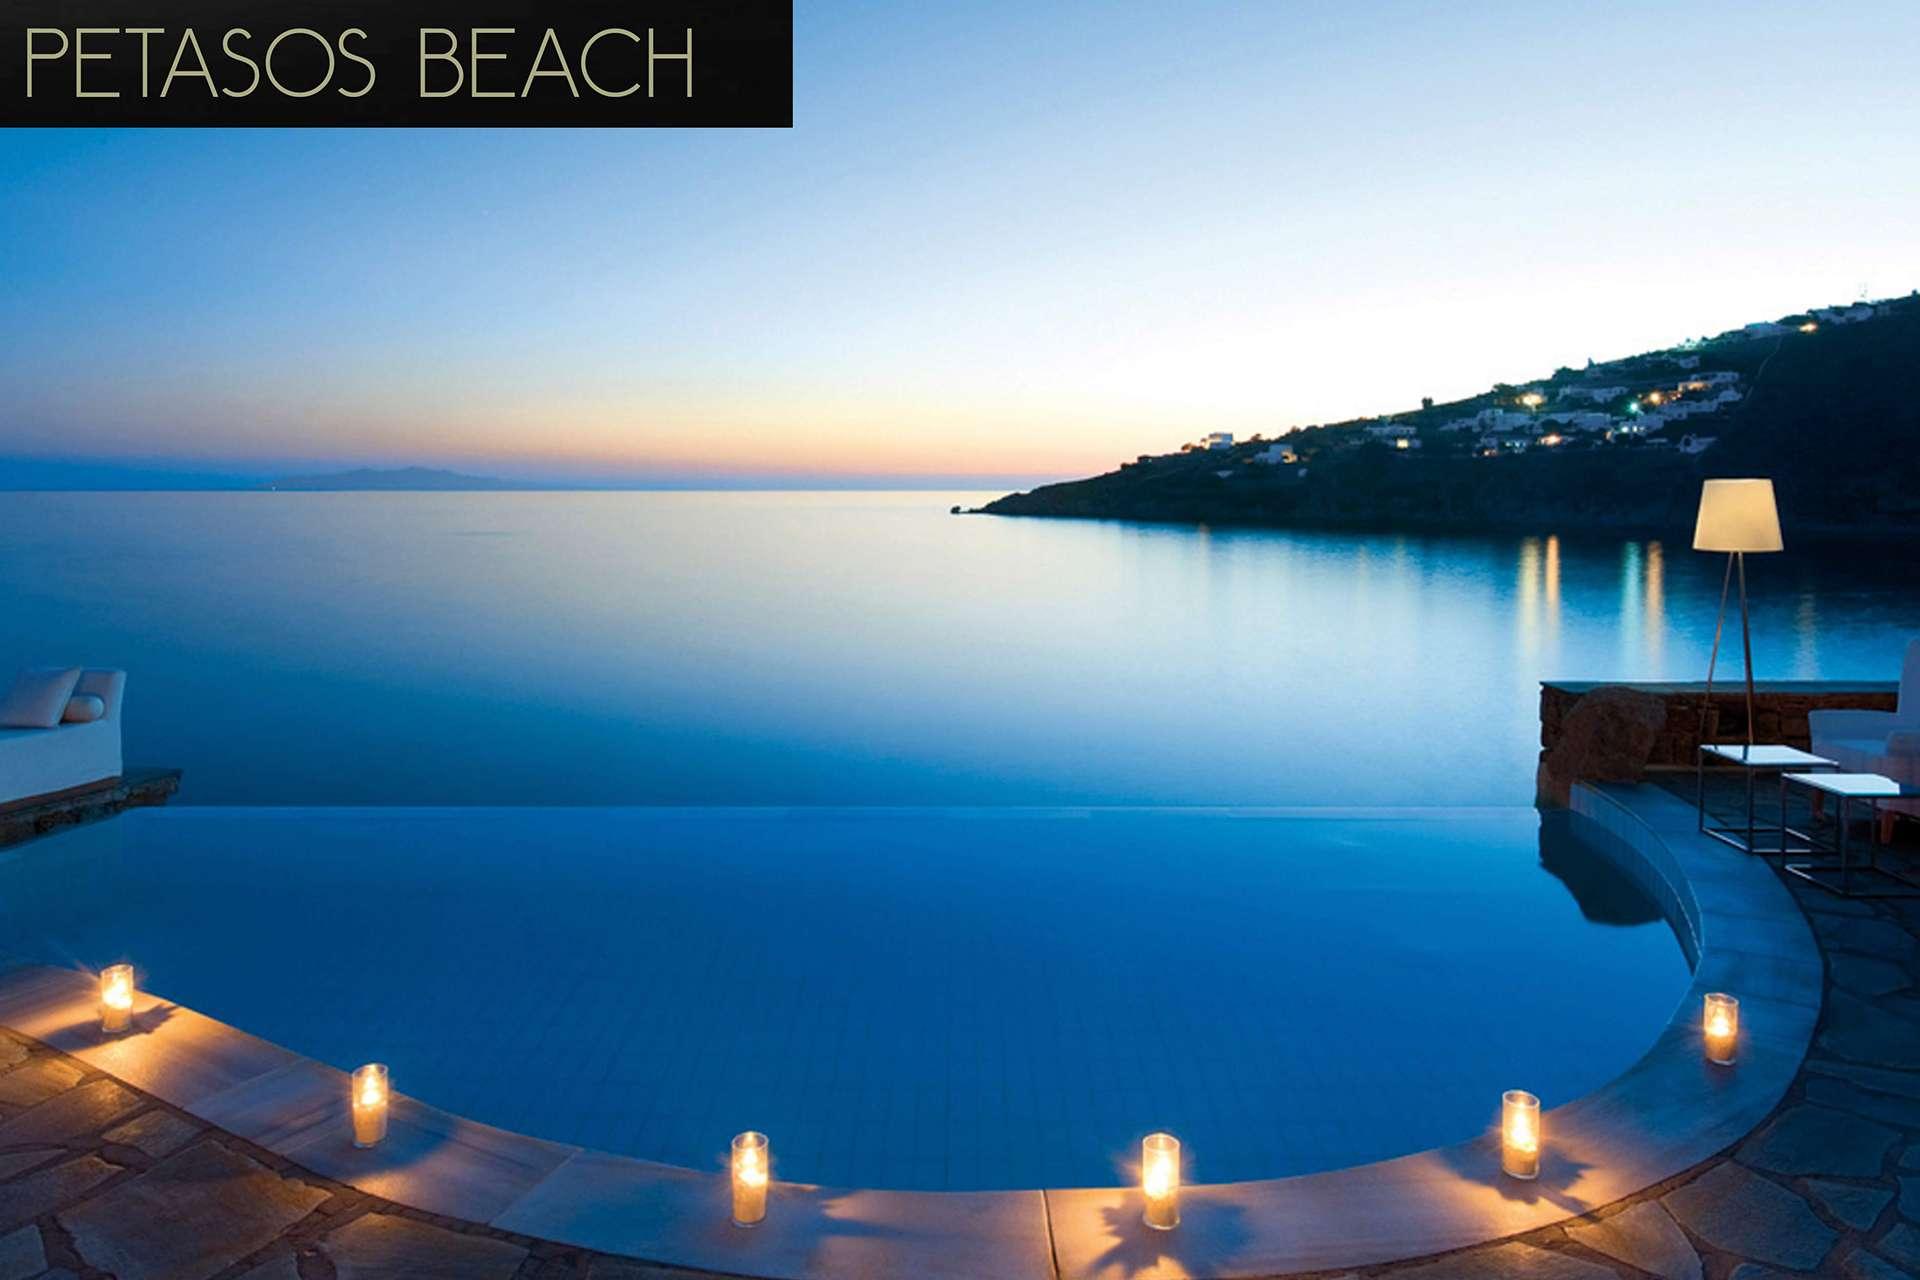 Petasos Beach Mykonos Resort